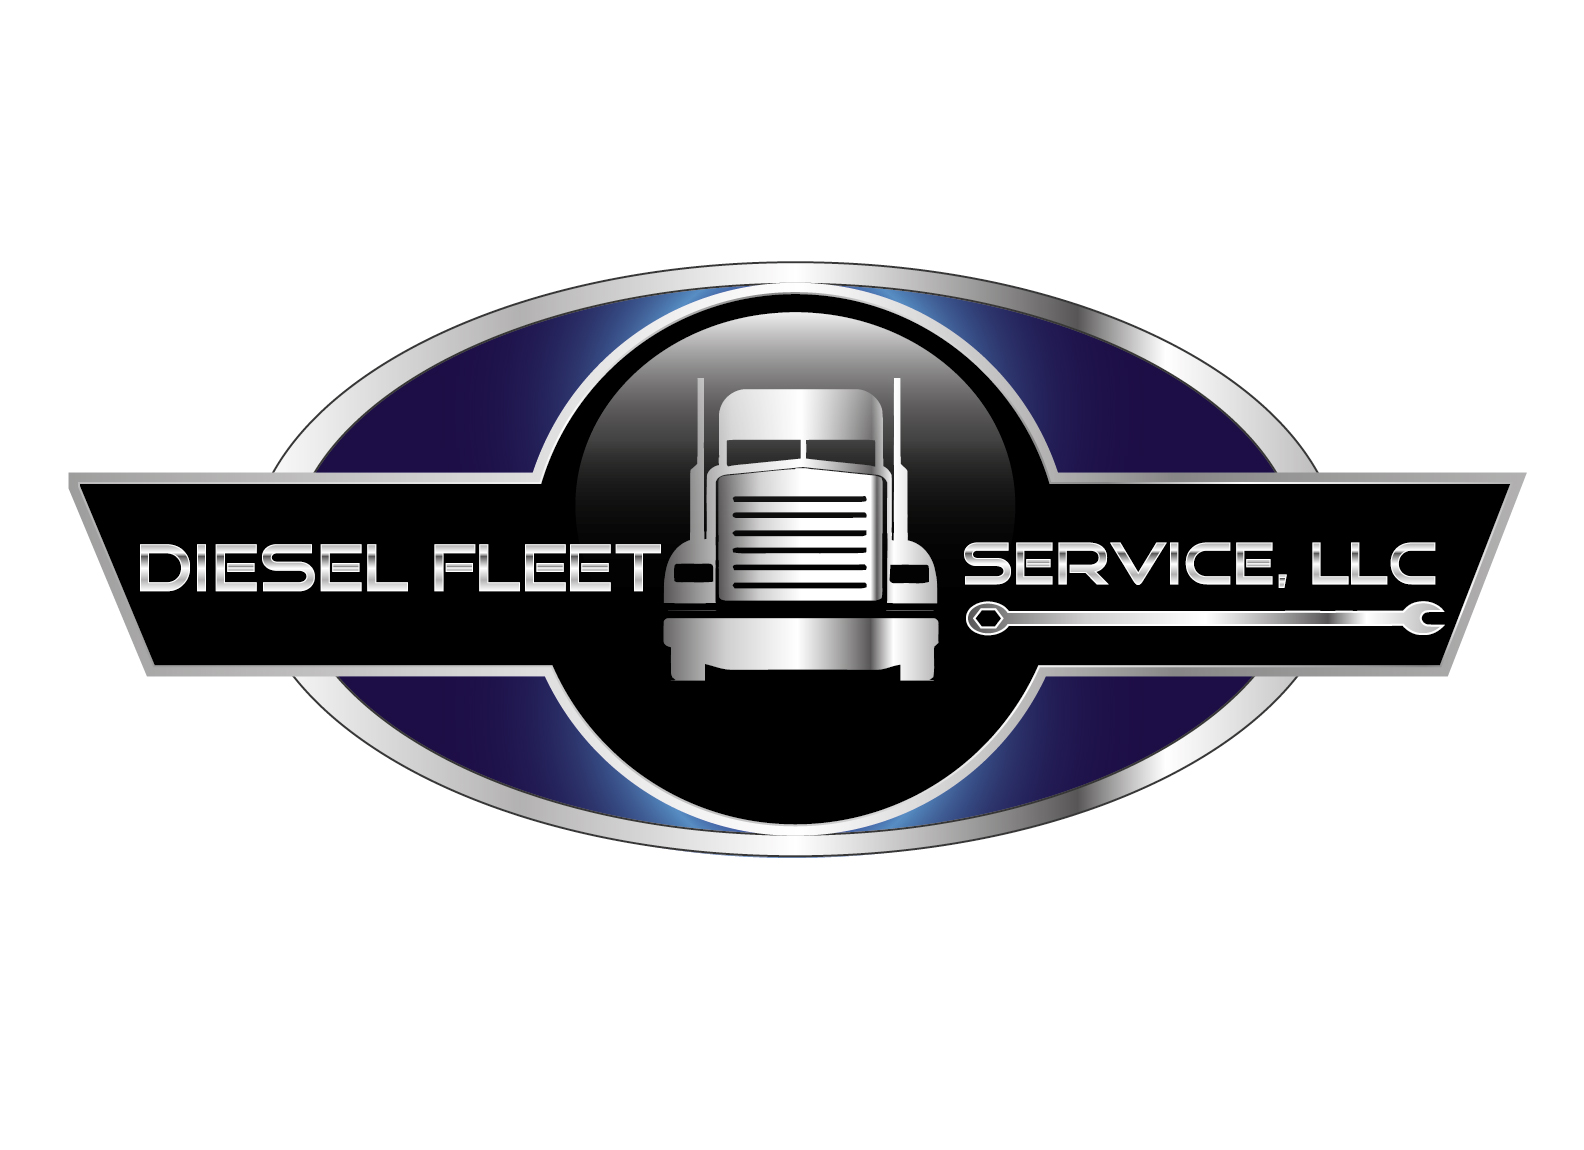 Logo Design by VENTSISLAV KOVACHEV - Entry No. 39 in the Logo Design Contest Artistic Logo Design for Diesel Fleet Service, LLC.